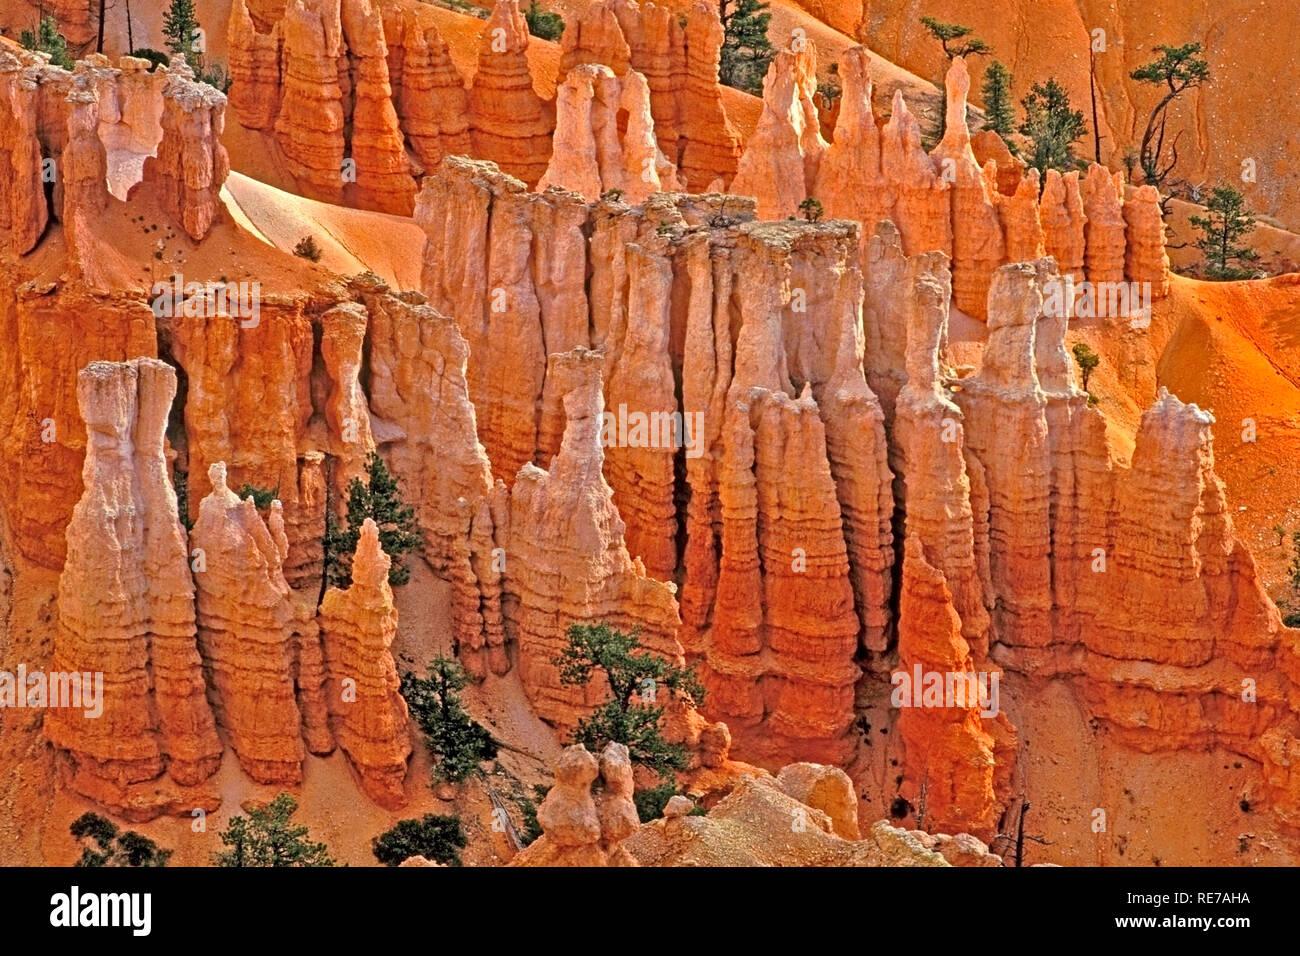 Limestone Rock Formations, Bryce Canyon National Park, Utah, USA - Stock Image